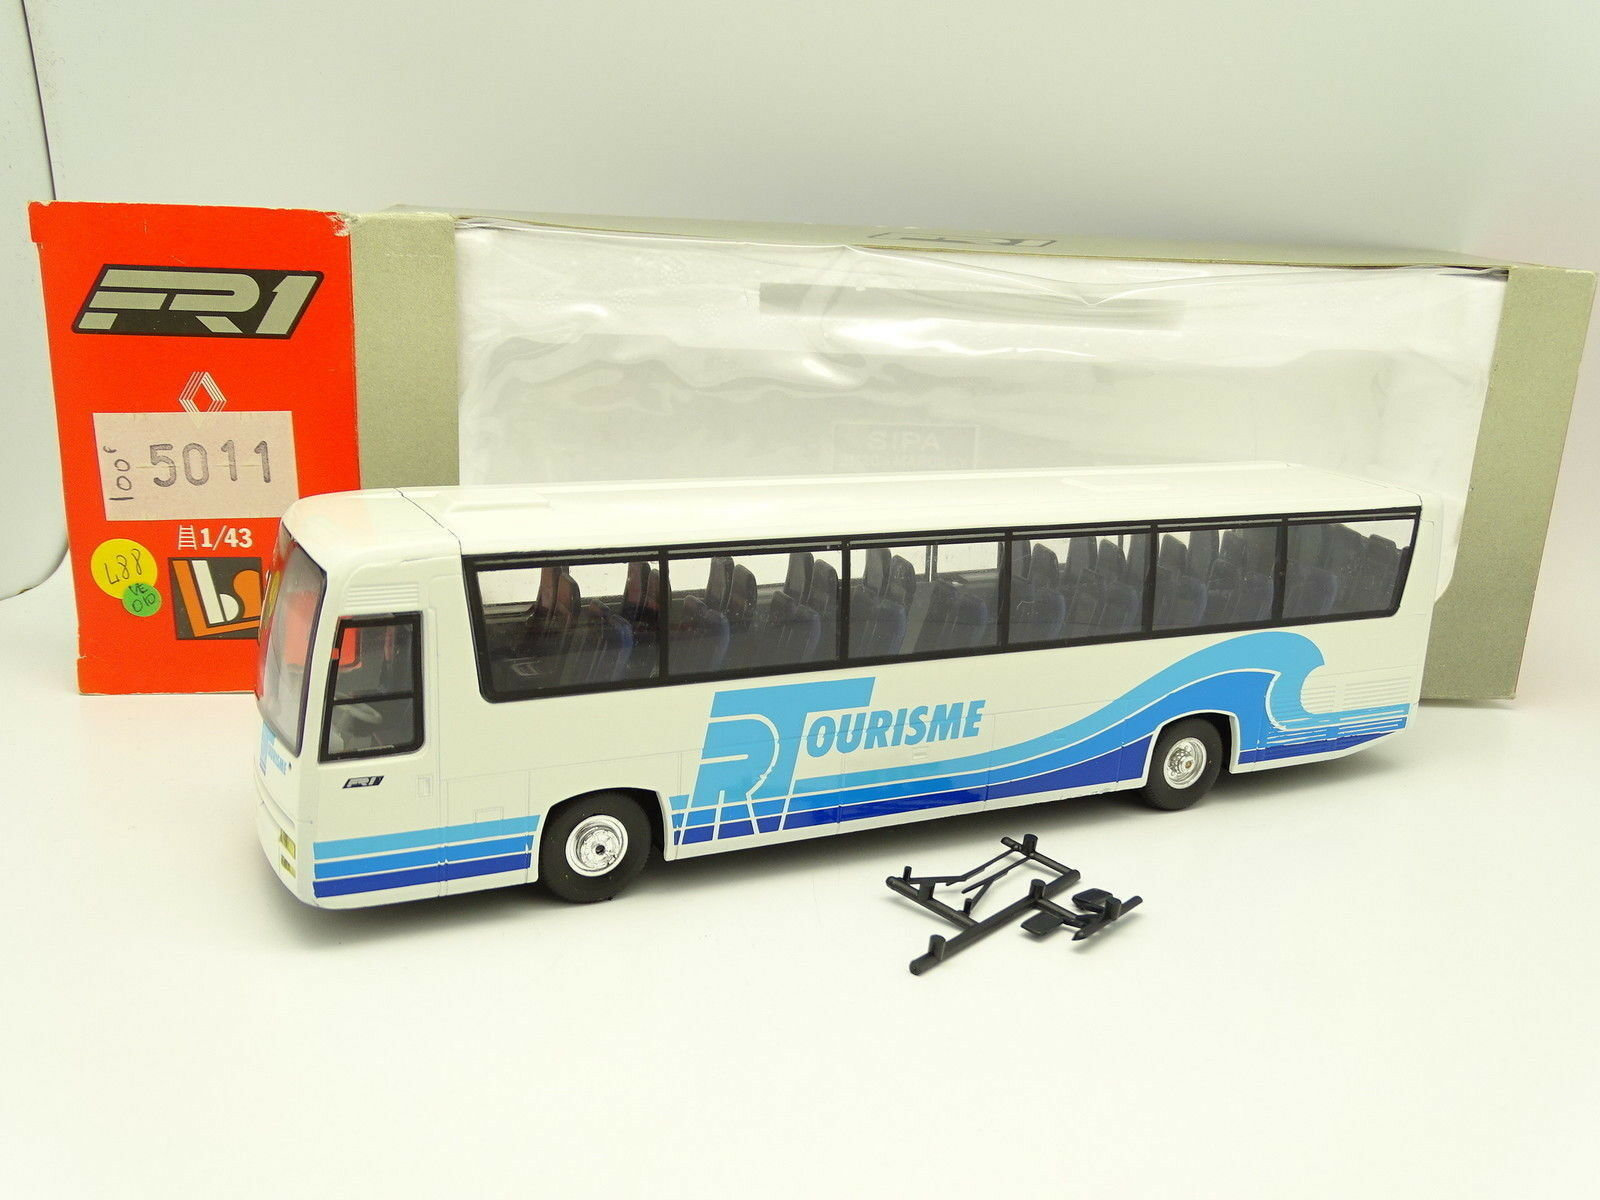 Eligor LBS 1 43 - Bus Car Autocar Renault FR1 RT Tourisme